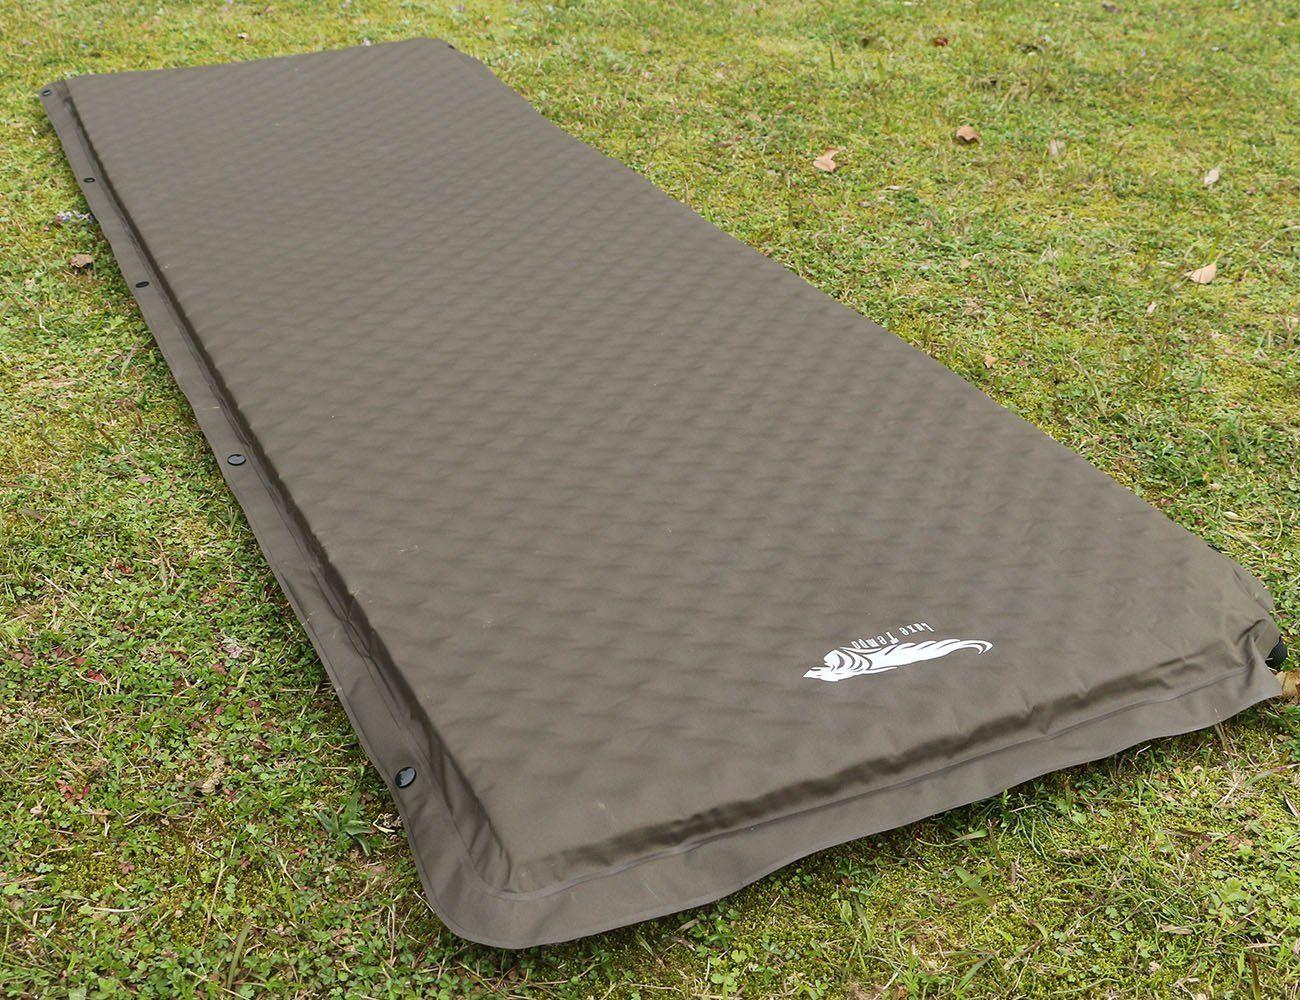 luxe tempo self inflating sleeping pad car camping mattress cot pad